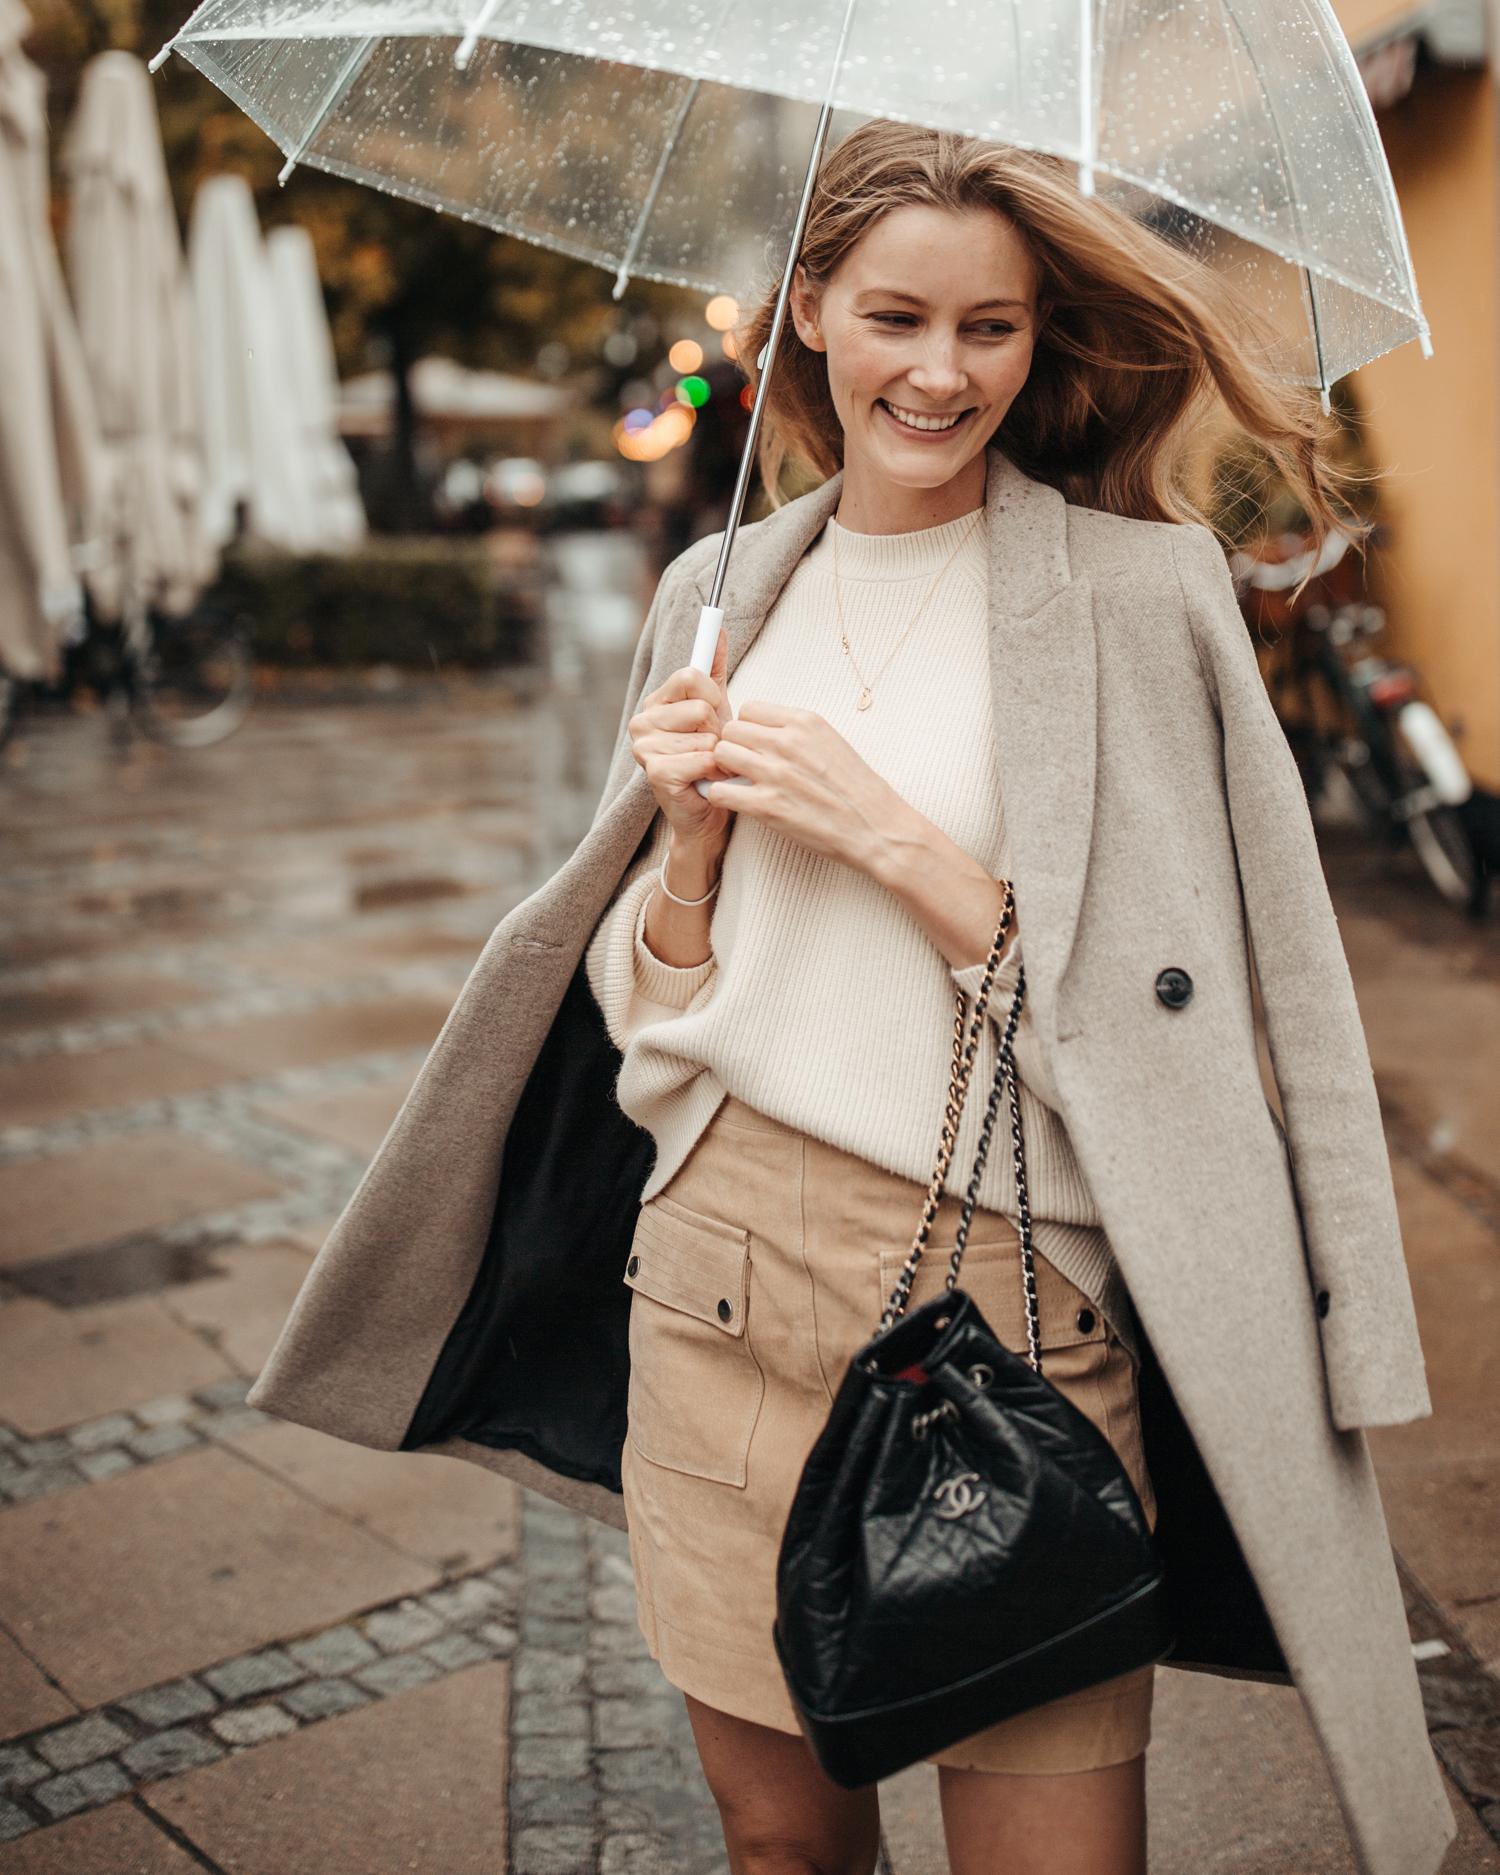 gennemsigtig-paraply